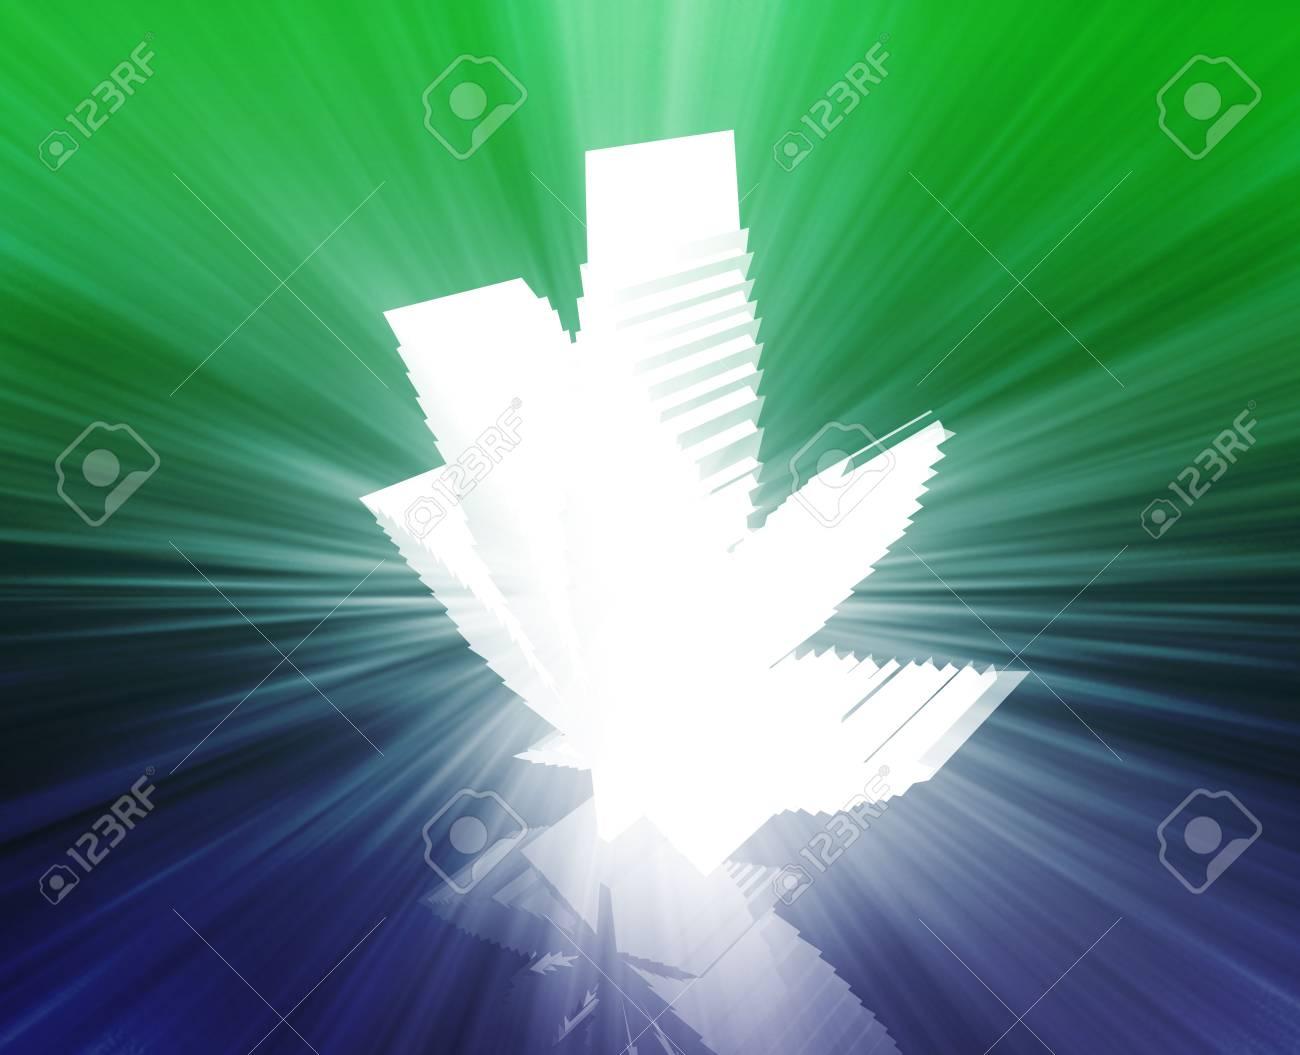 Marijuana cannabis leaf illustration, abstract symbol design Stock Photo - 6188271